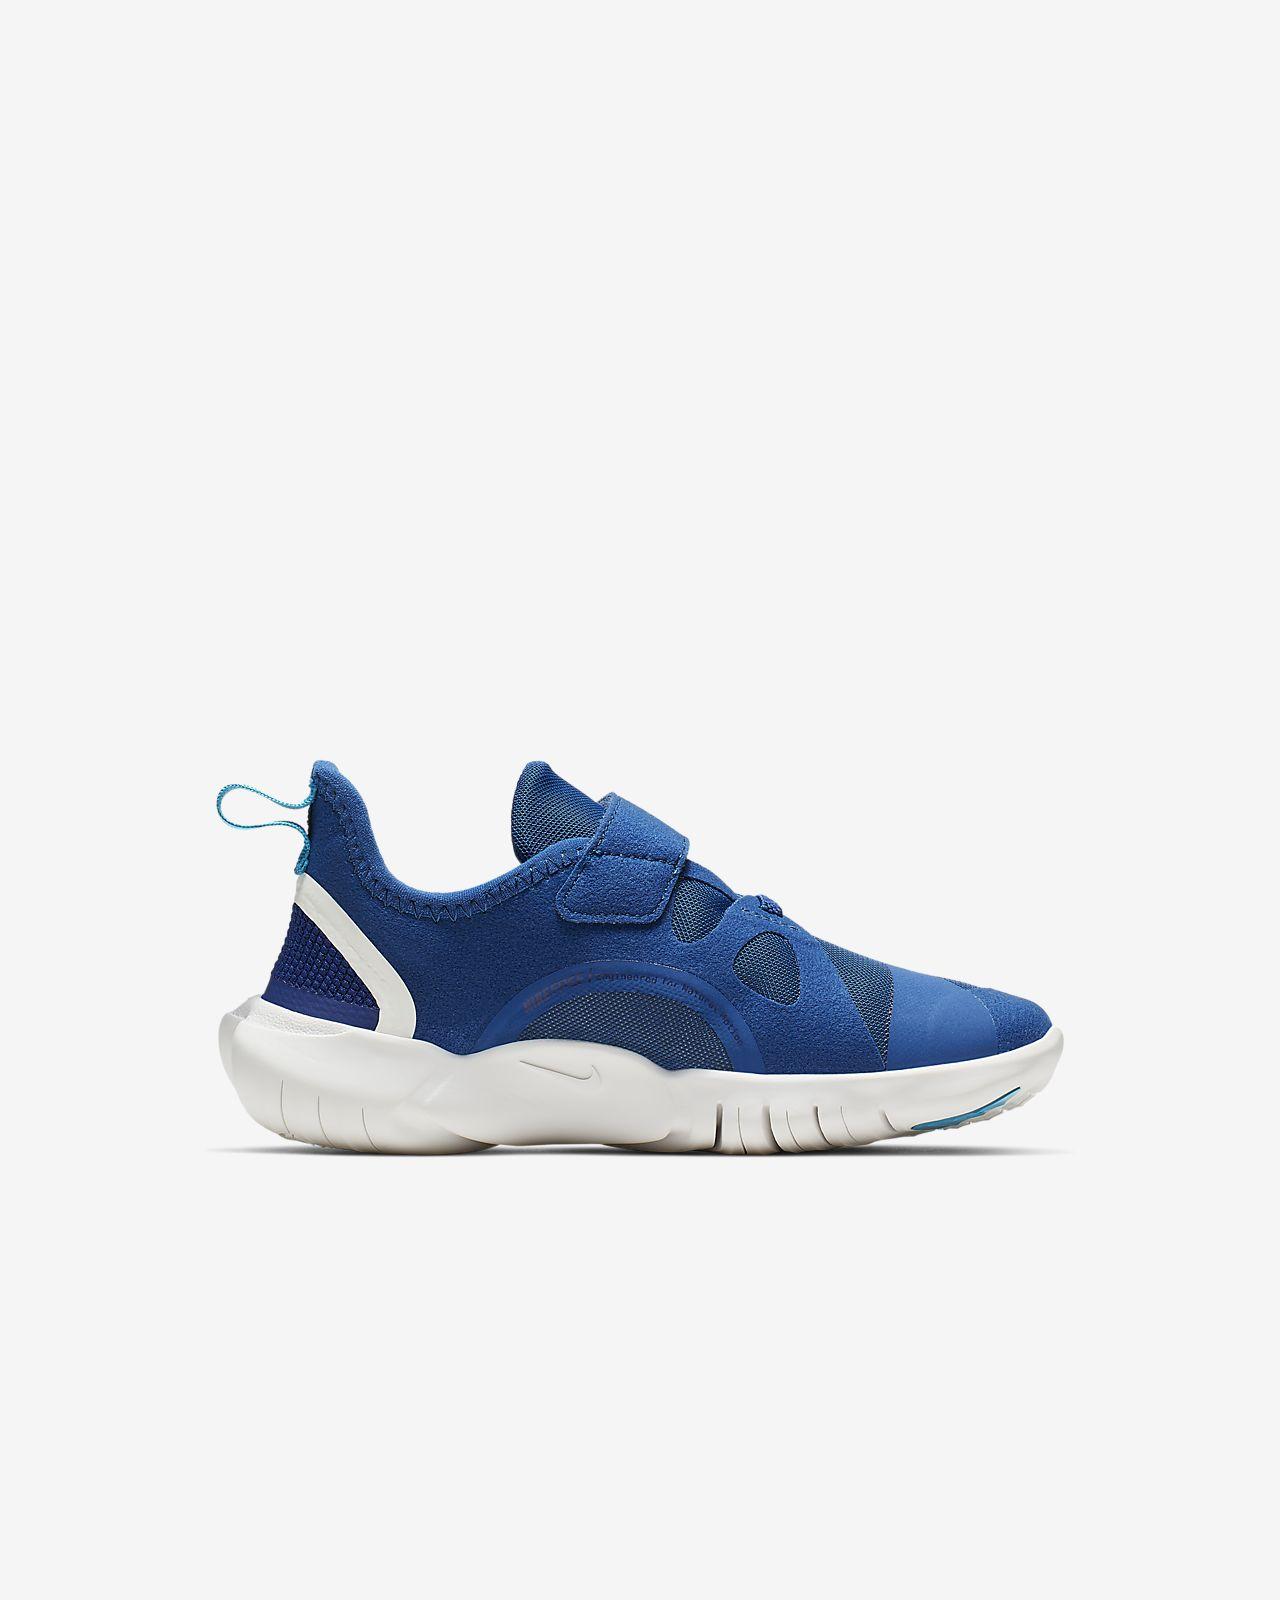 new product d92d5 f4957 ... Nike Free RN 5.0 Little Kids  Shoe